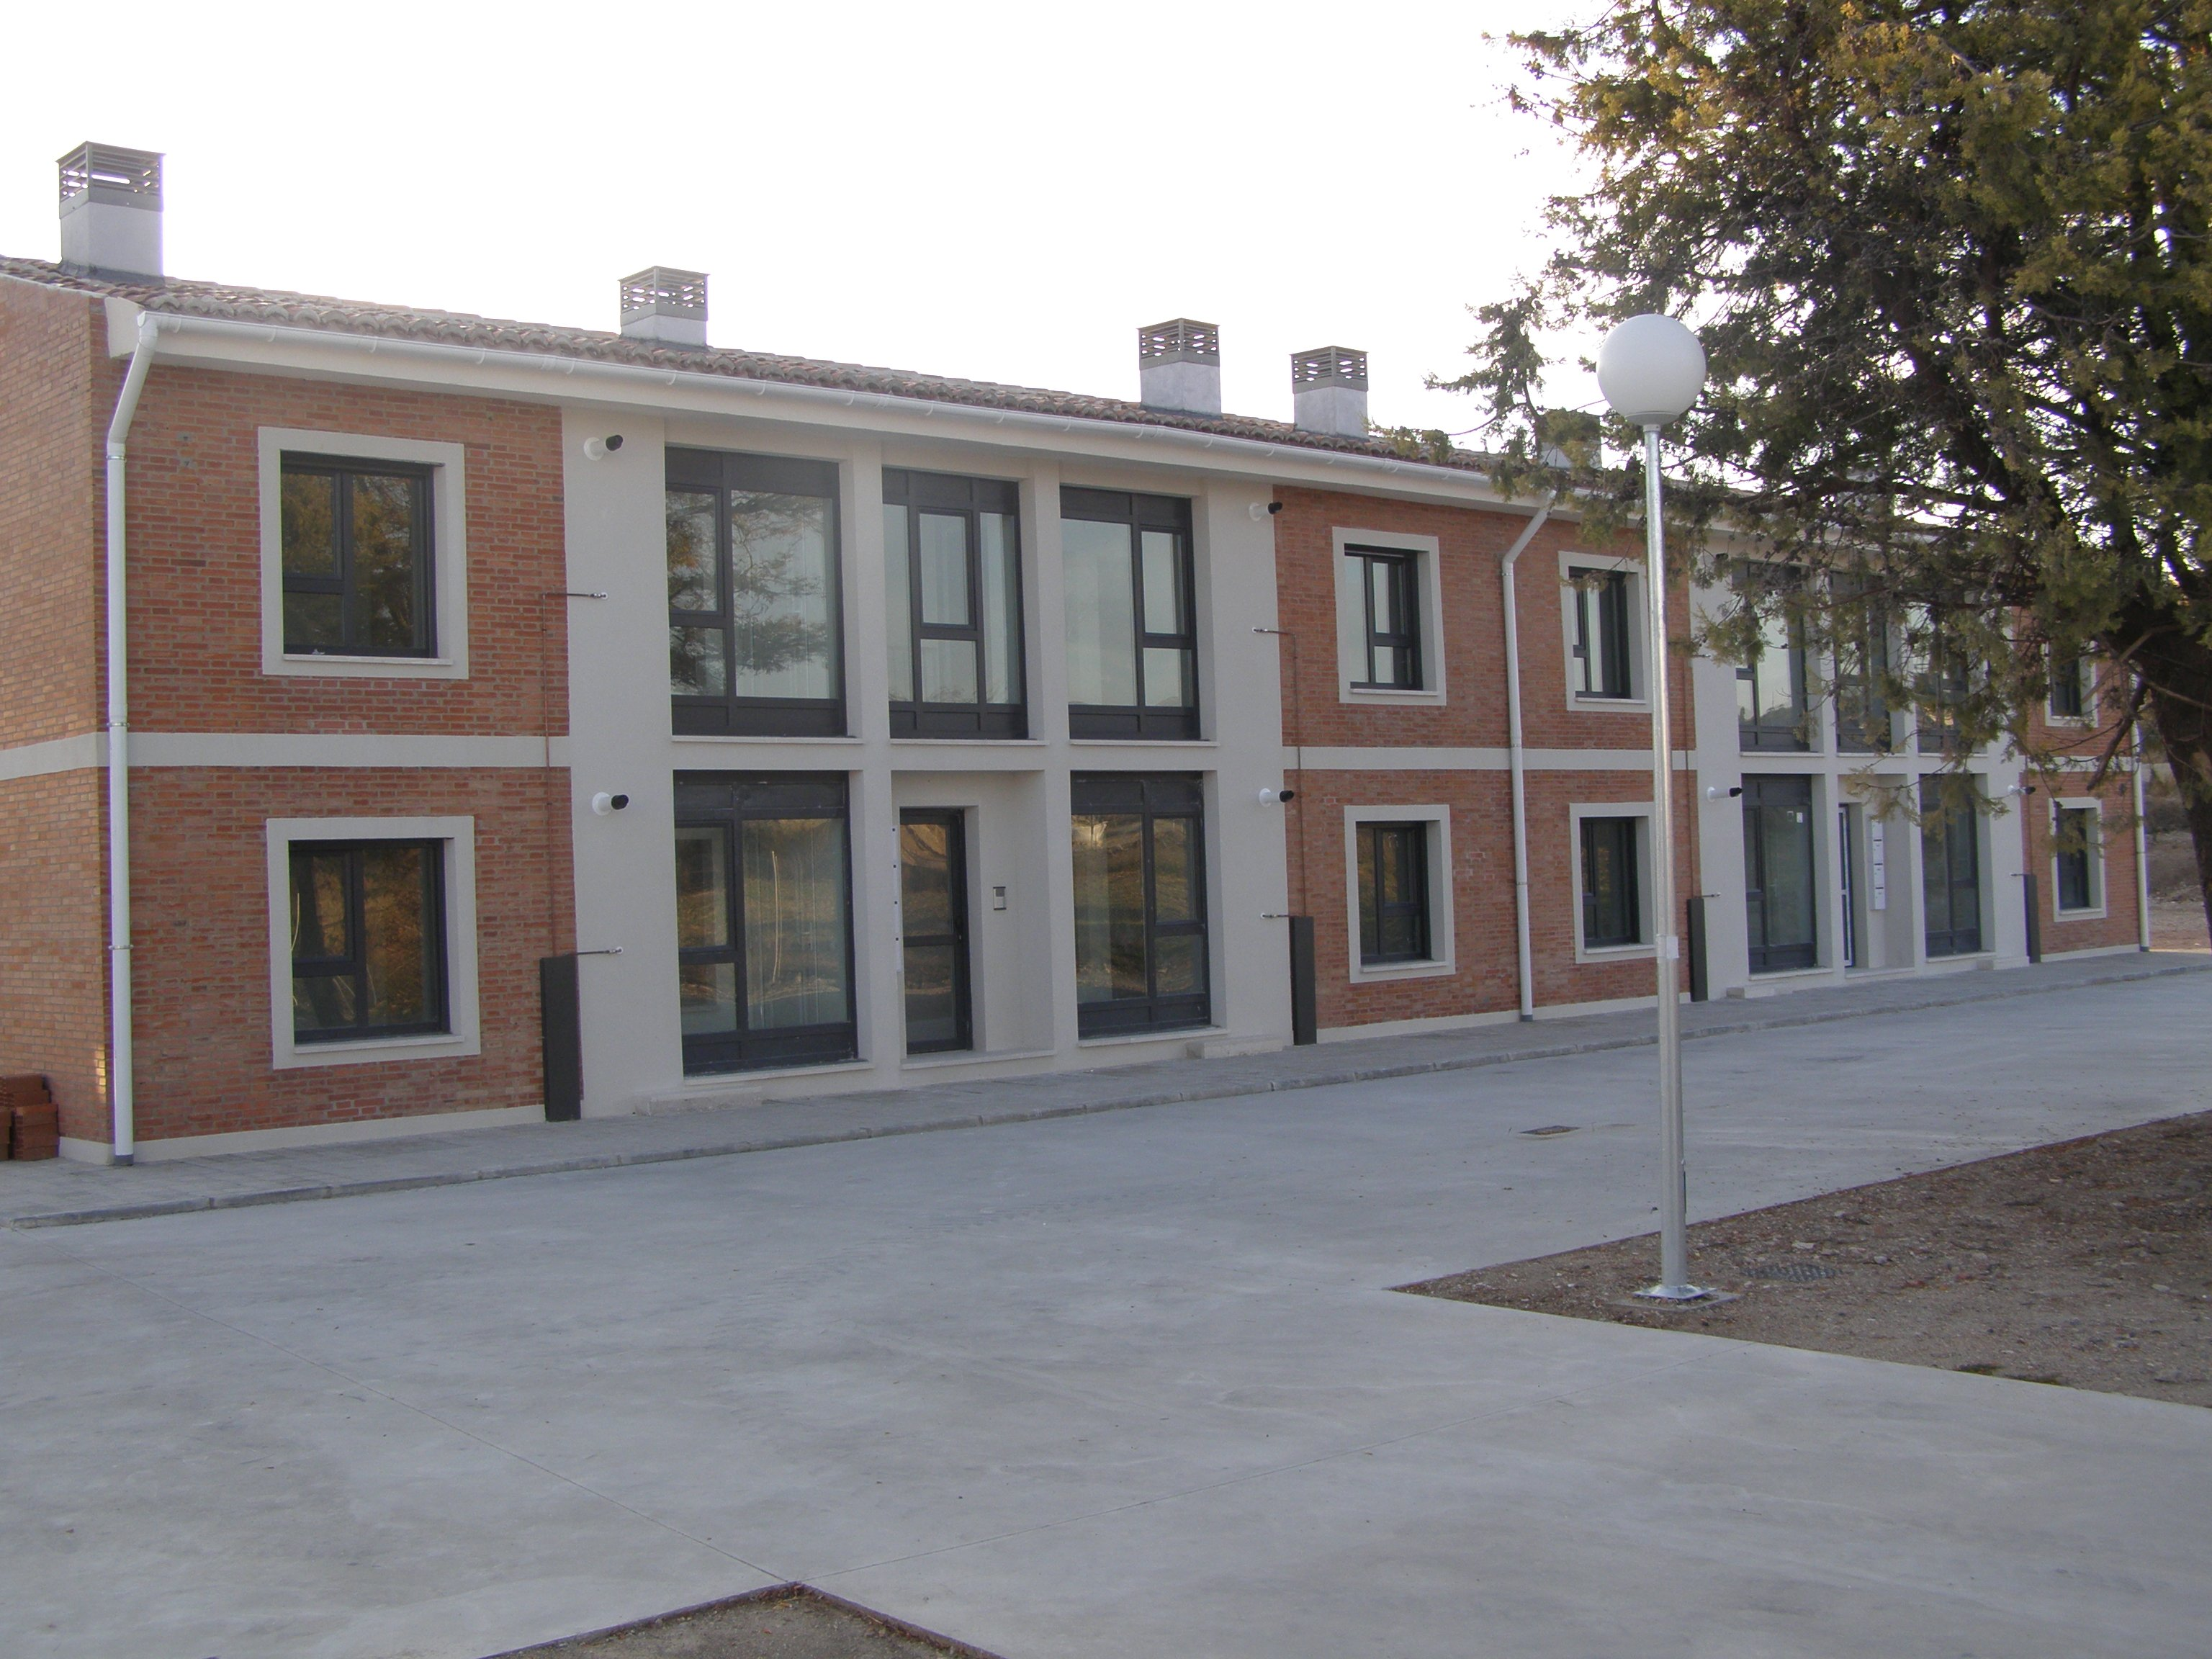 Proyecto de Rehabilitación- Cuartel de Baltanás (Palencia)